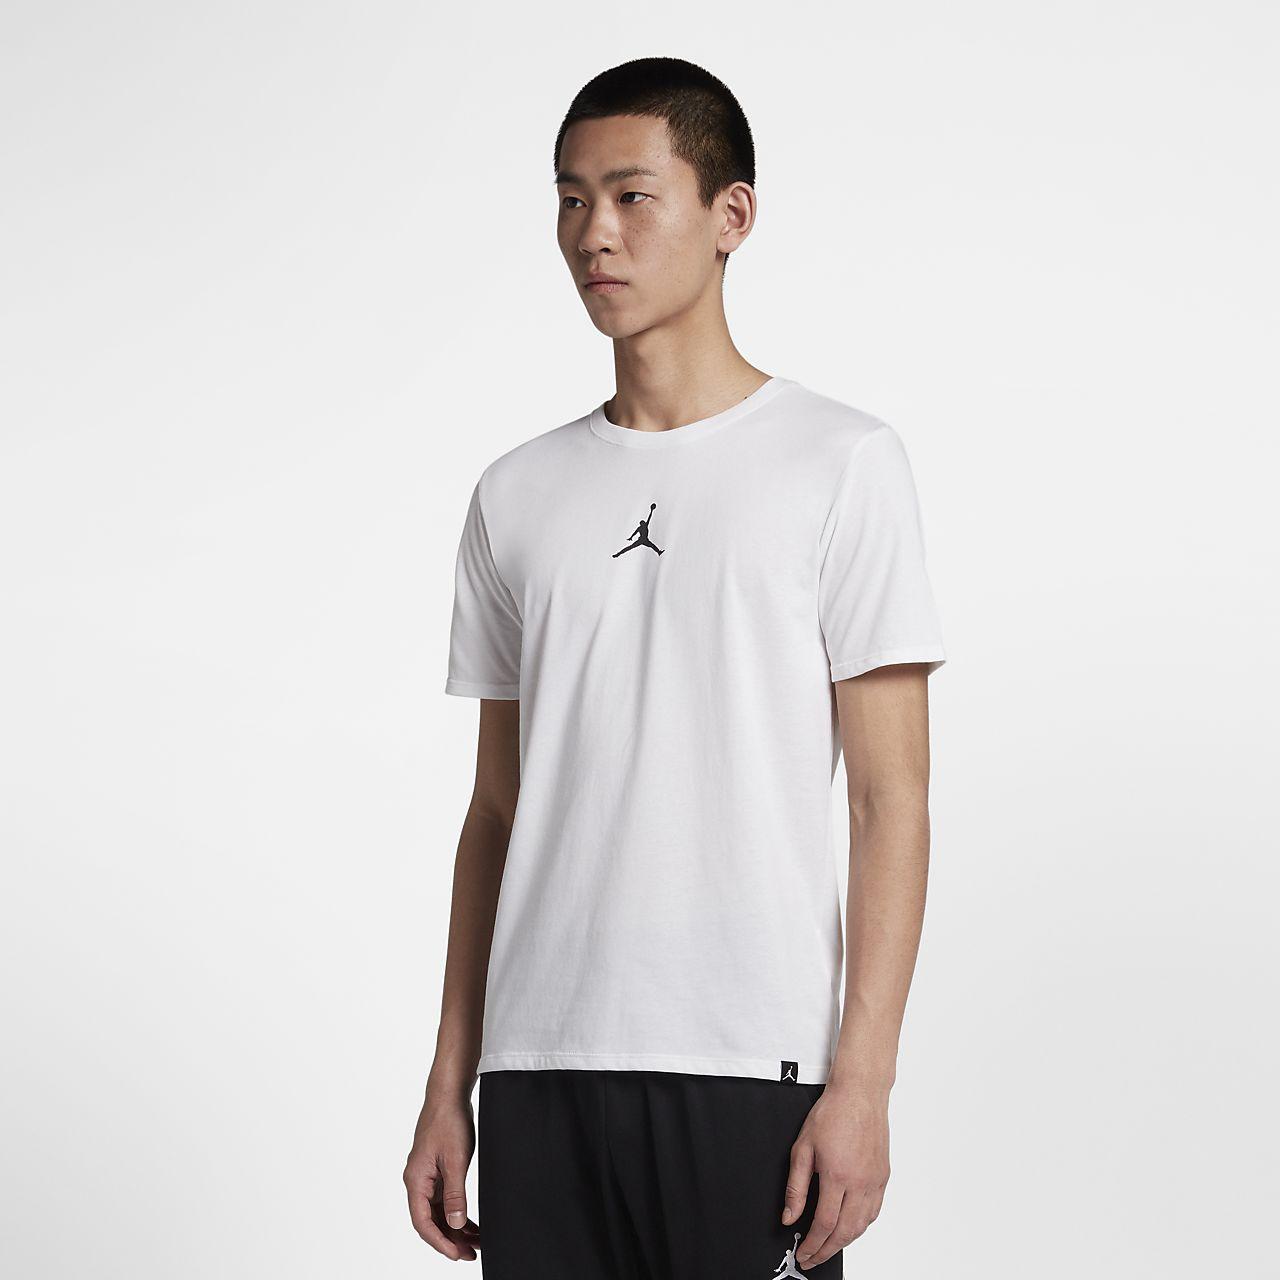 Jordan Iconic 男子训练T恤